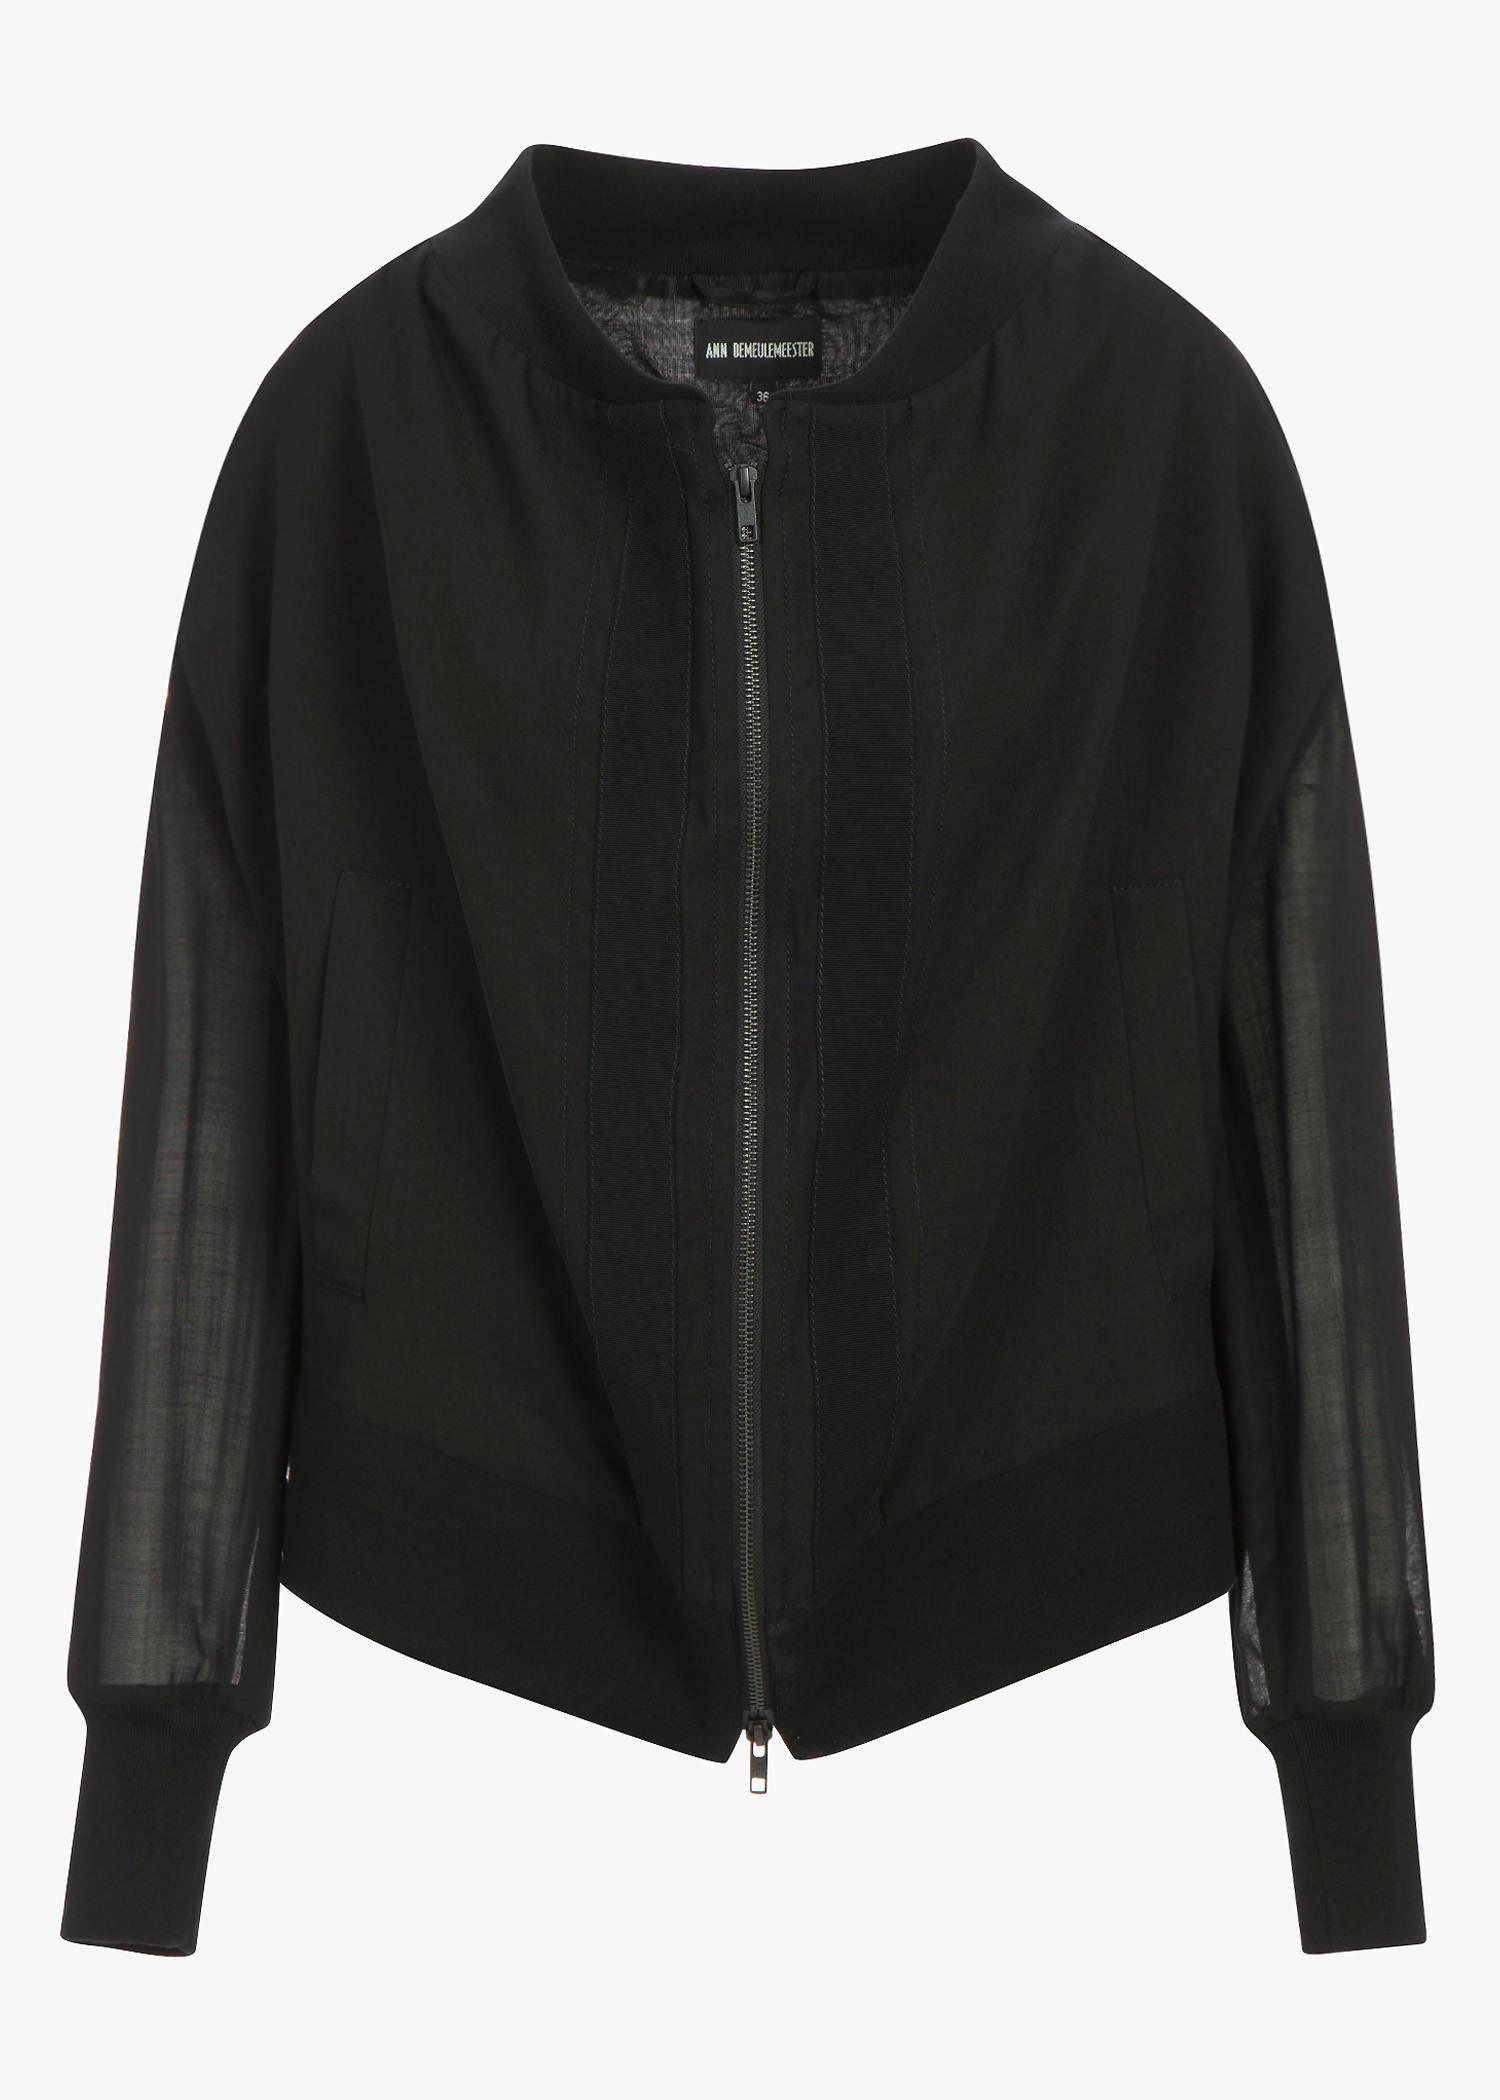 Ann Demeulemeester Fluid Collar Bomber Jacket In Black